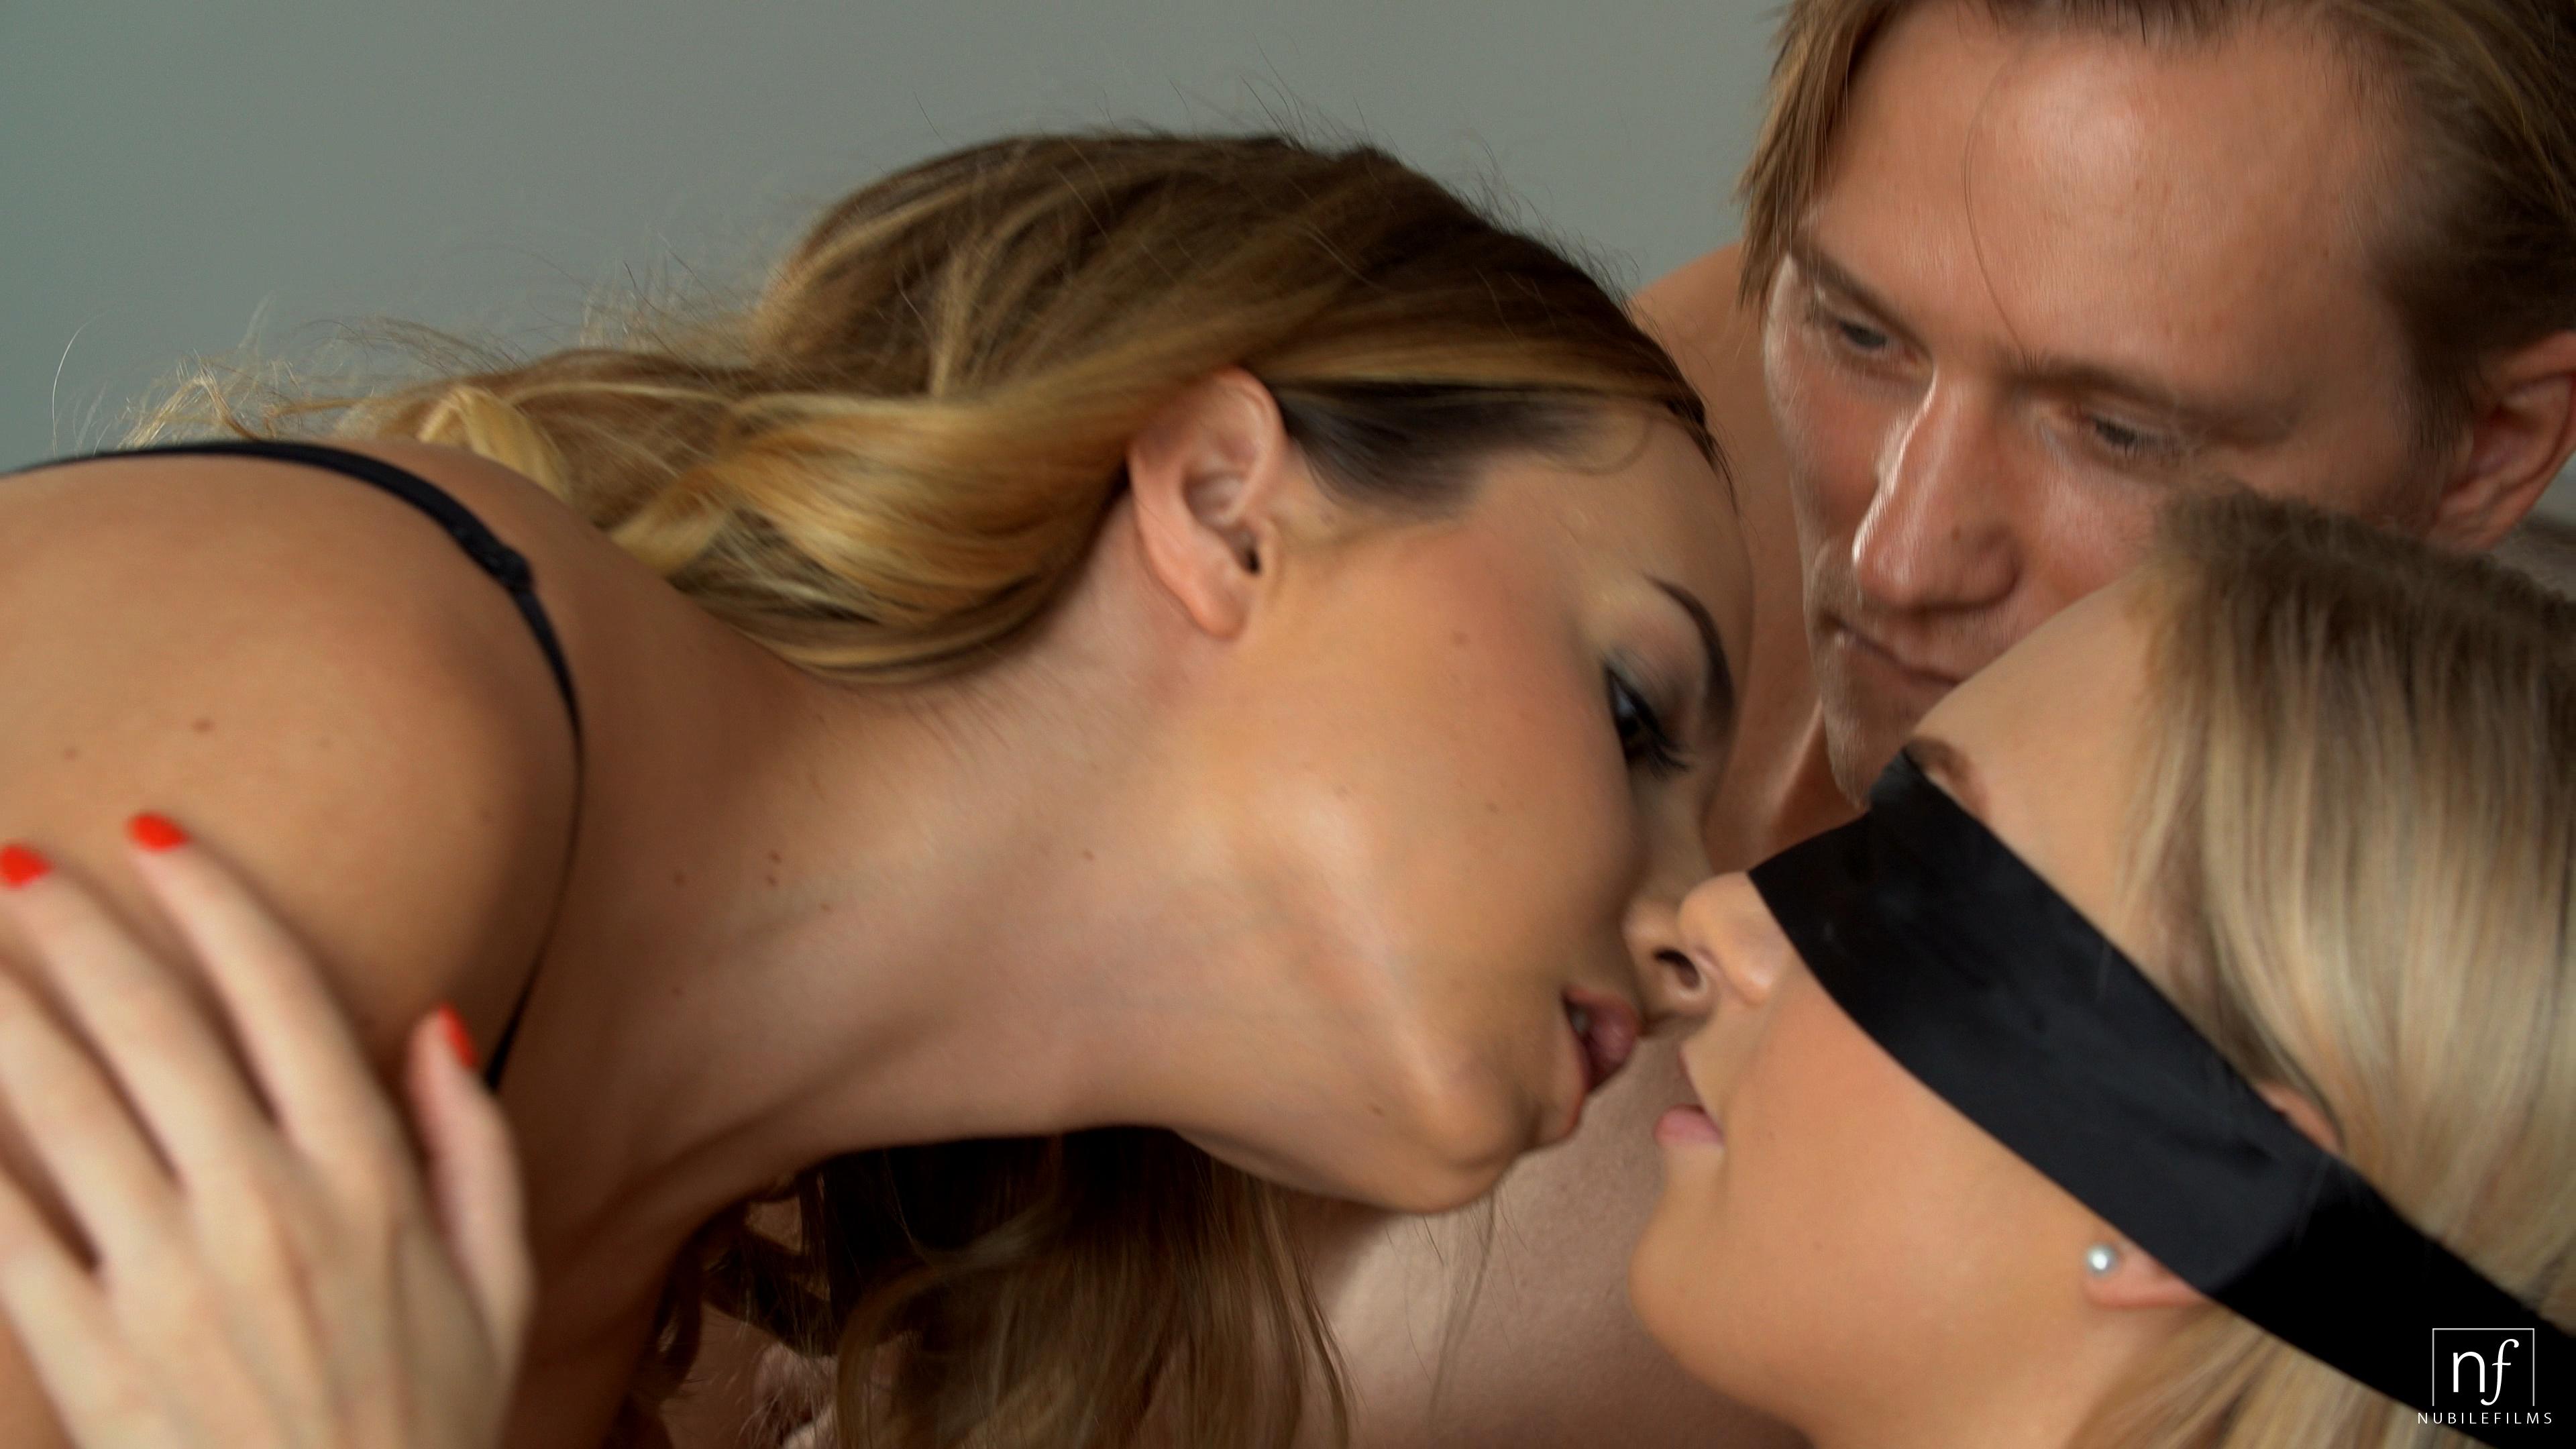 NubileFilms.com - Jenny Wild,Mona Blue,Stanley Johnson: Sharing My Girlfriend - S37:E6